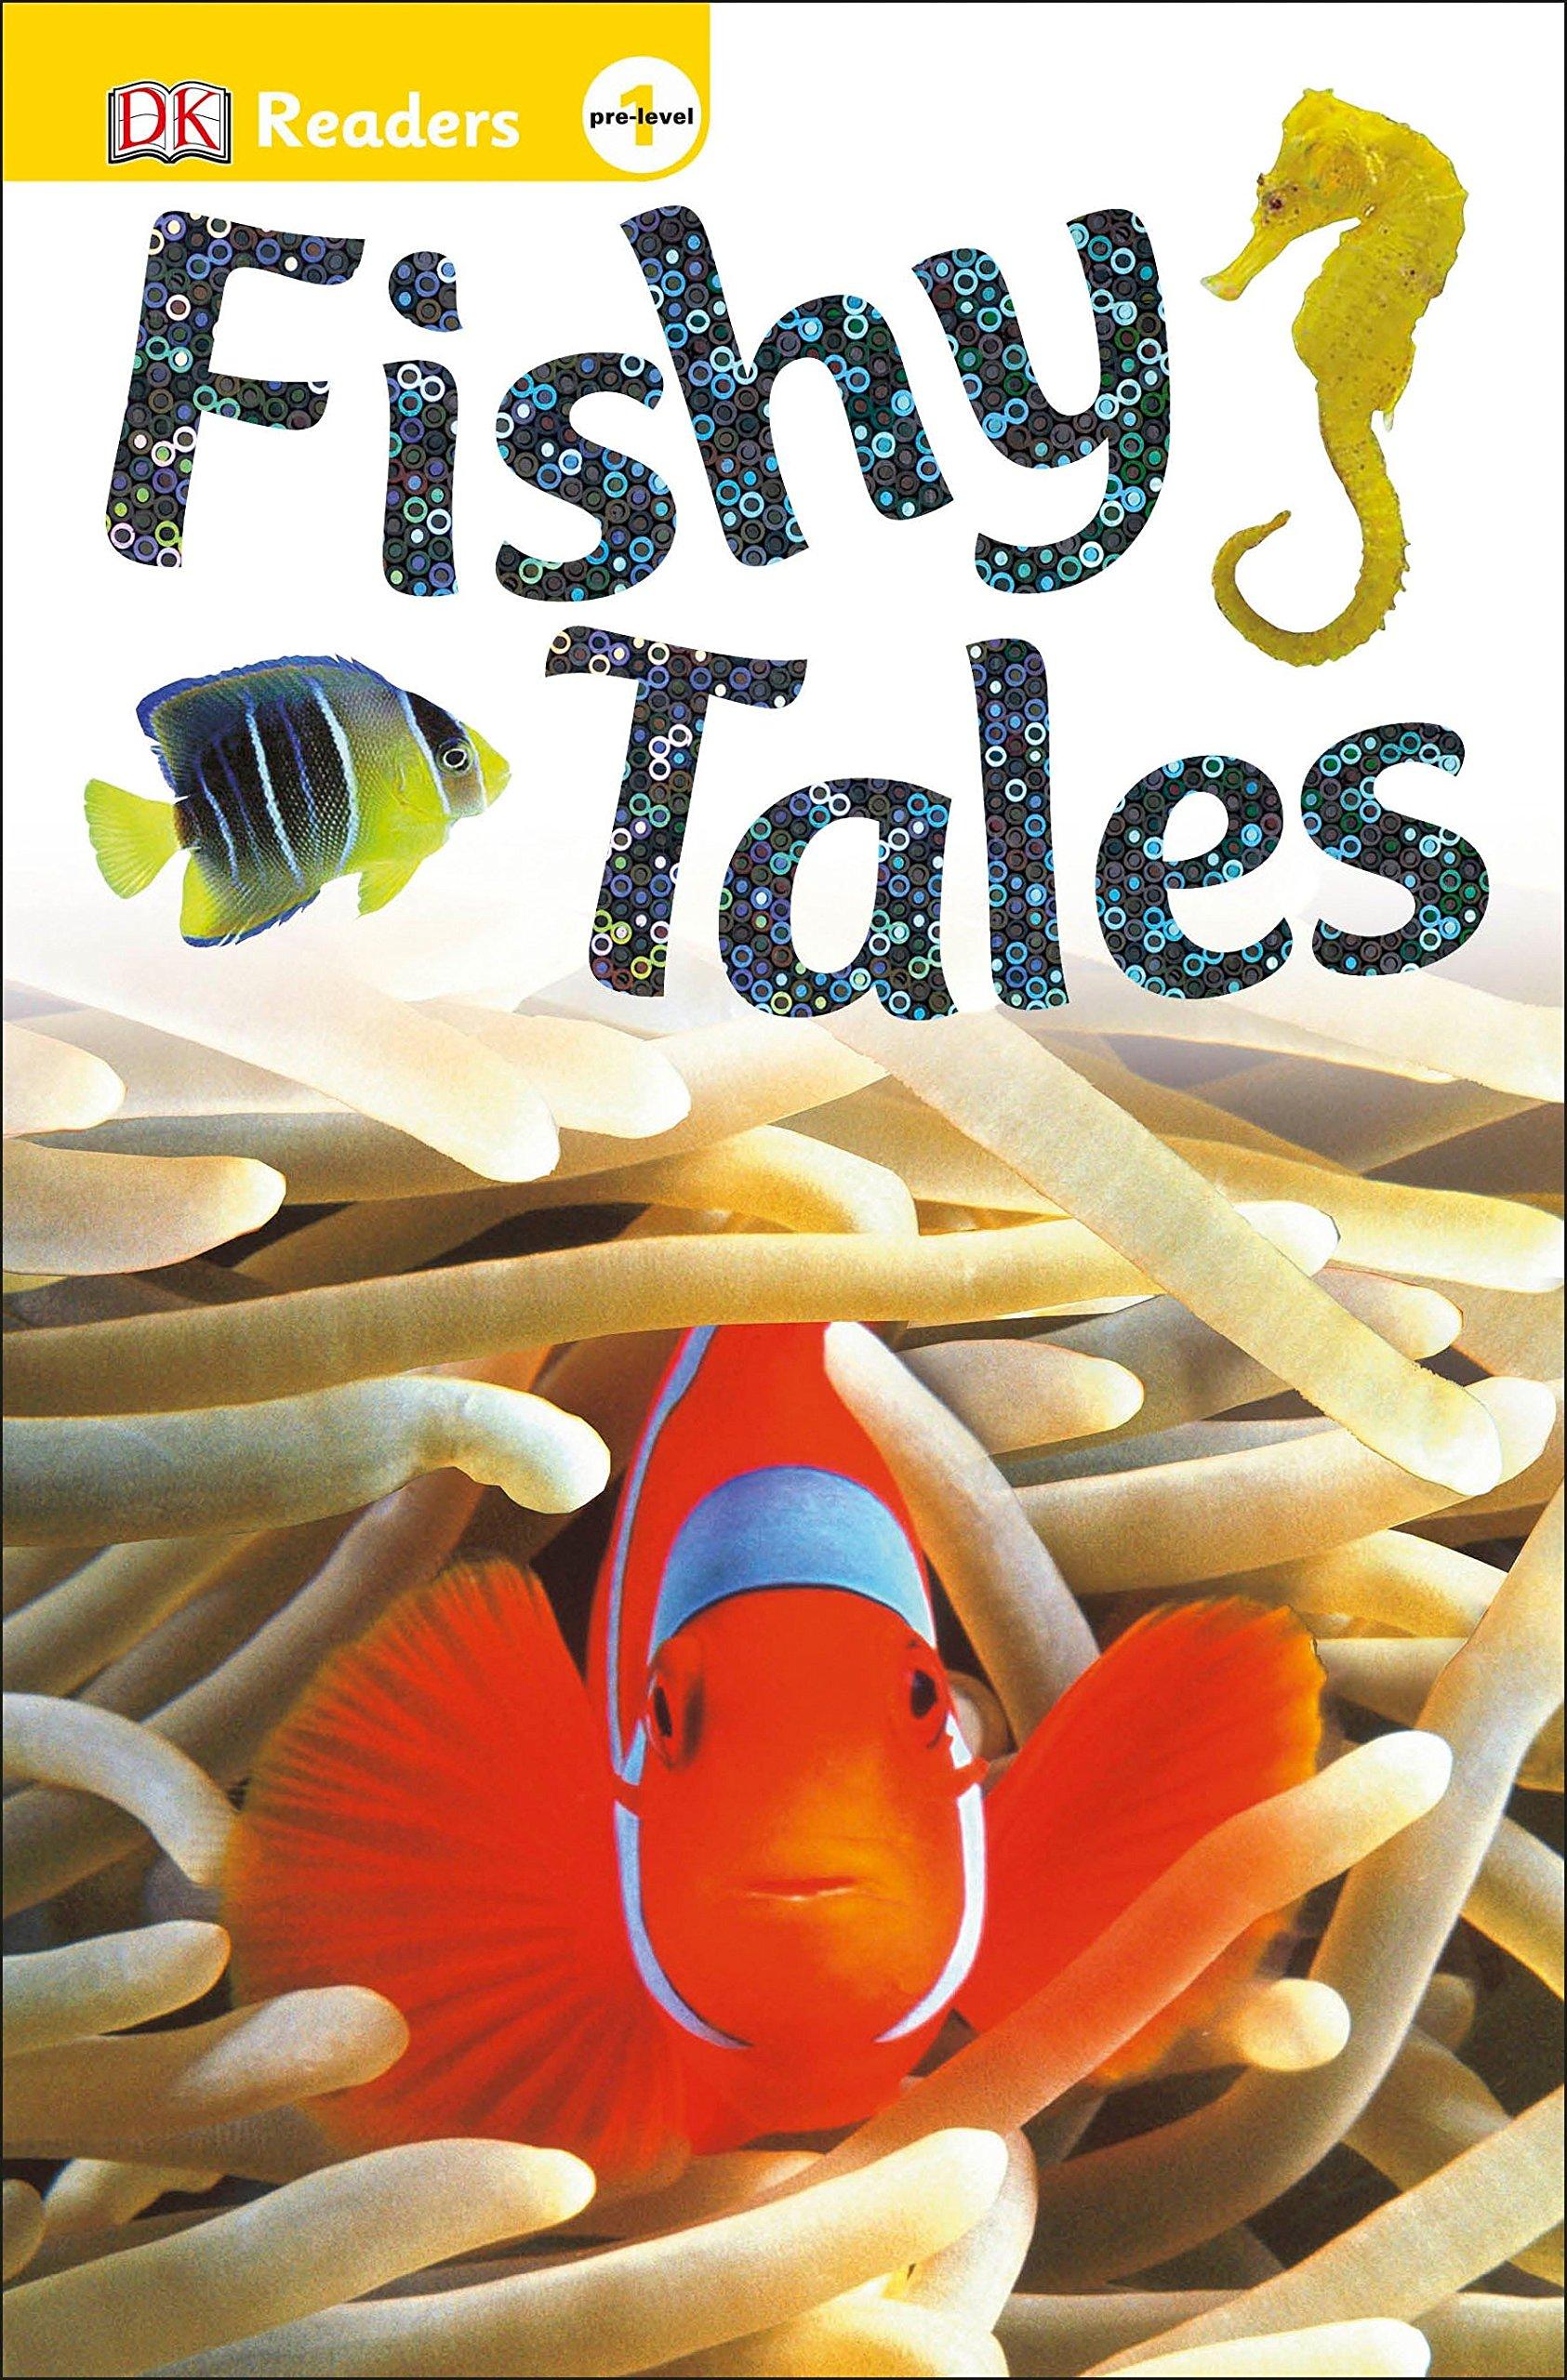 Fishy Tales (DK Readers Pre-level 1)